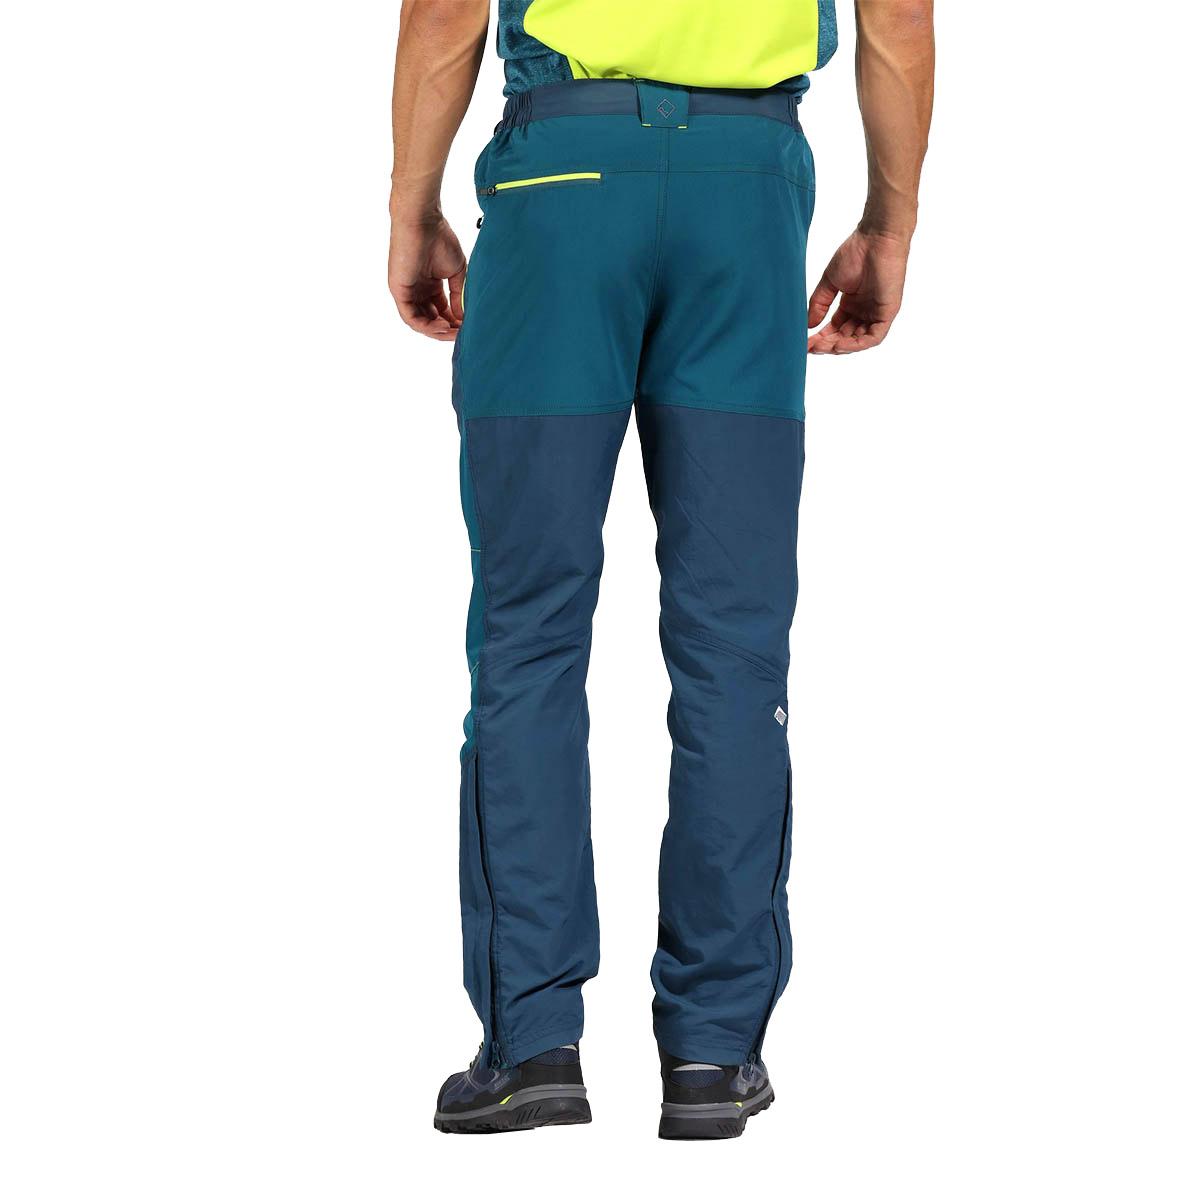 Regatta-Mens-Sungari-Lightweight-Water-Repellent-Stretch-Trousers-70-OFF-RRP thumbnail 3